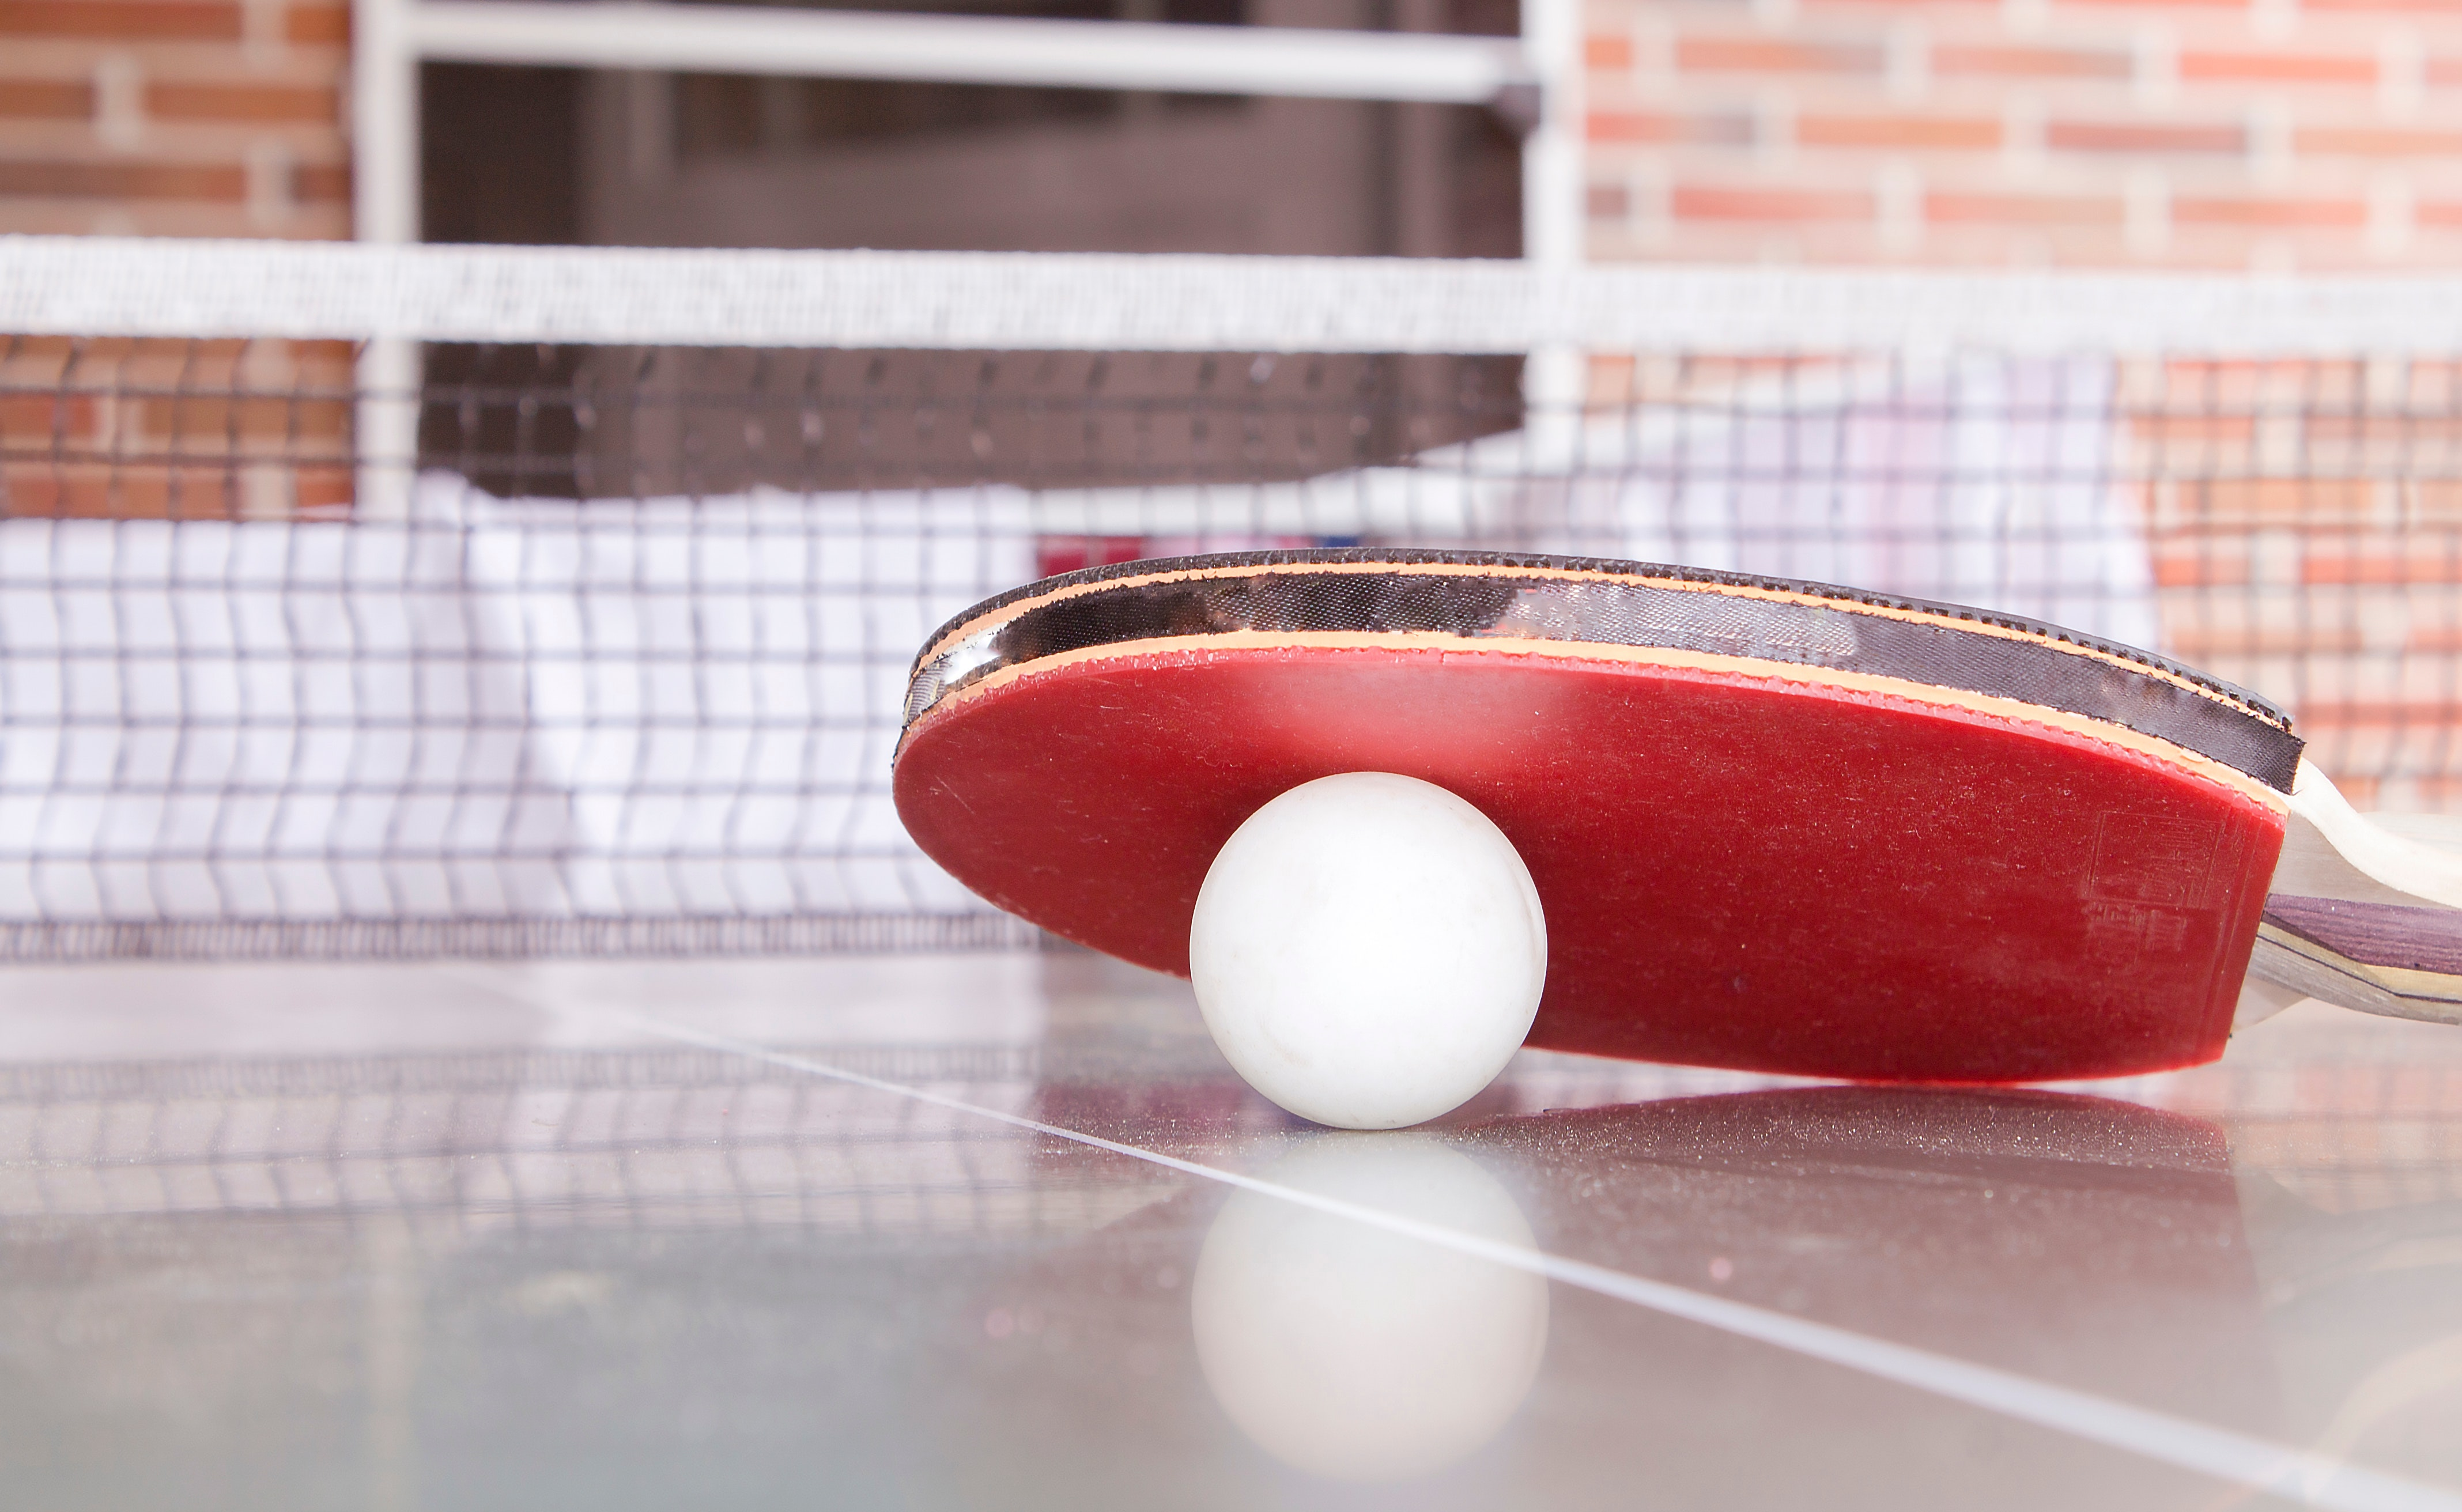 image - tennis de table.jpg